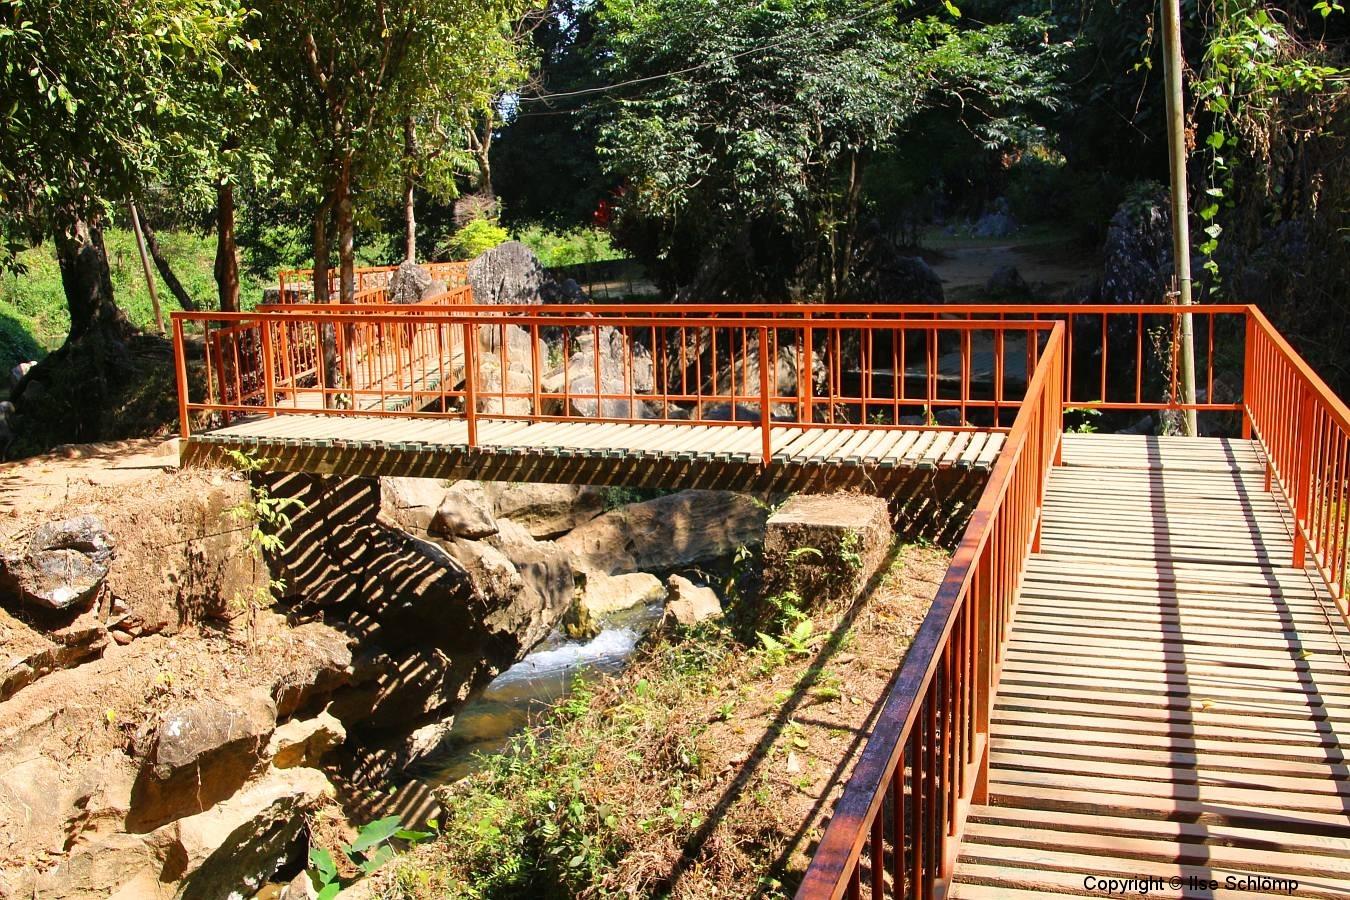 Laos, Vang Vieng, Tham Chang, Zickzack-Brücke